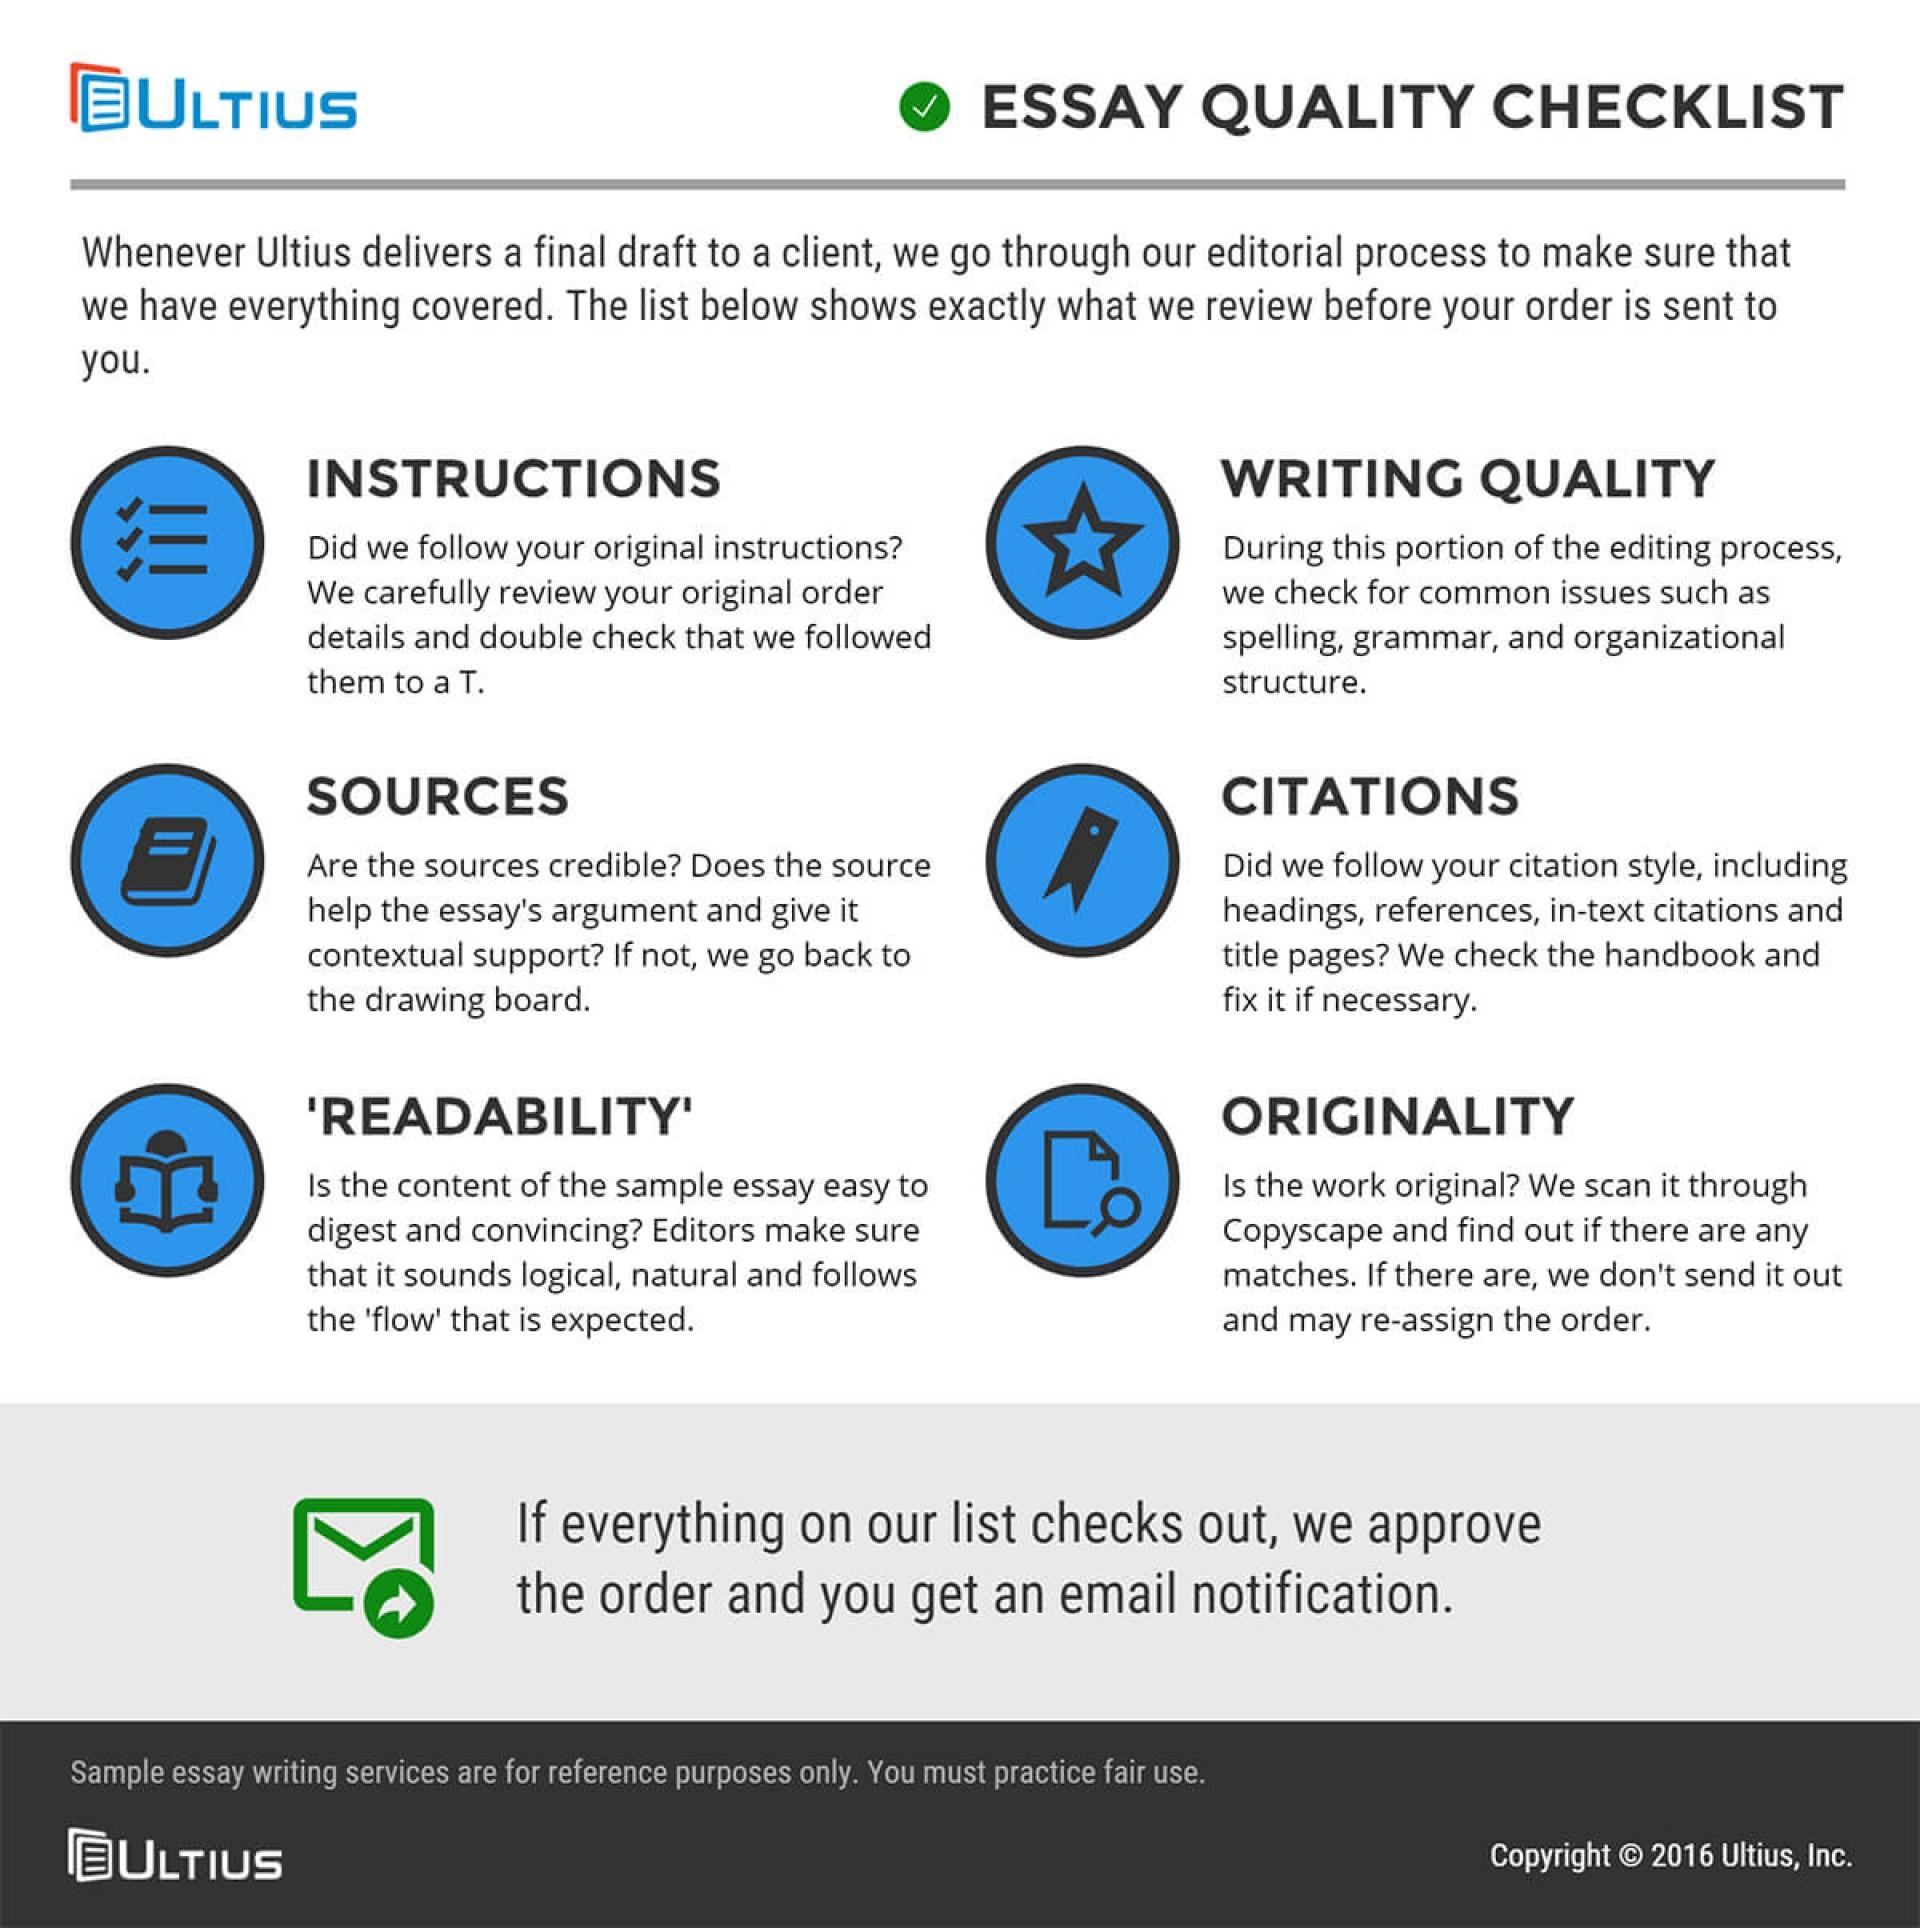 009 Essay Check Example Purchased Quality Unique Checking Services Persuasive Checklist Pdf Checker Grammar Punctuation Free 1920